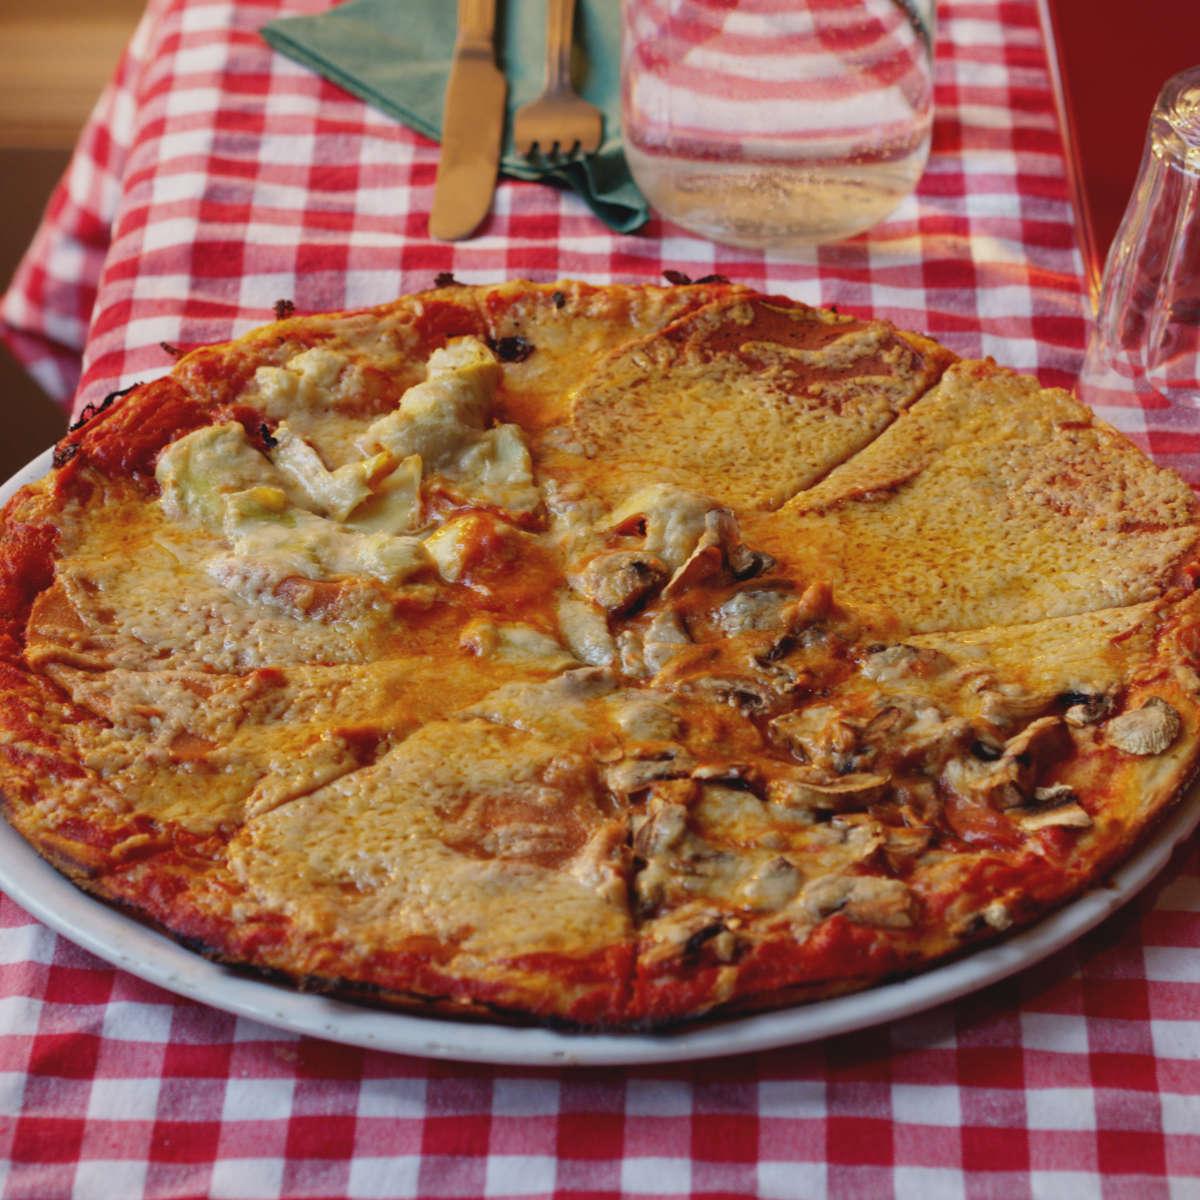 Vegan four seasons pizza at Novapizza, Edinburgh